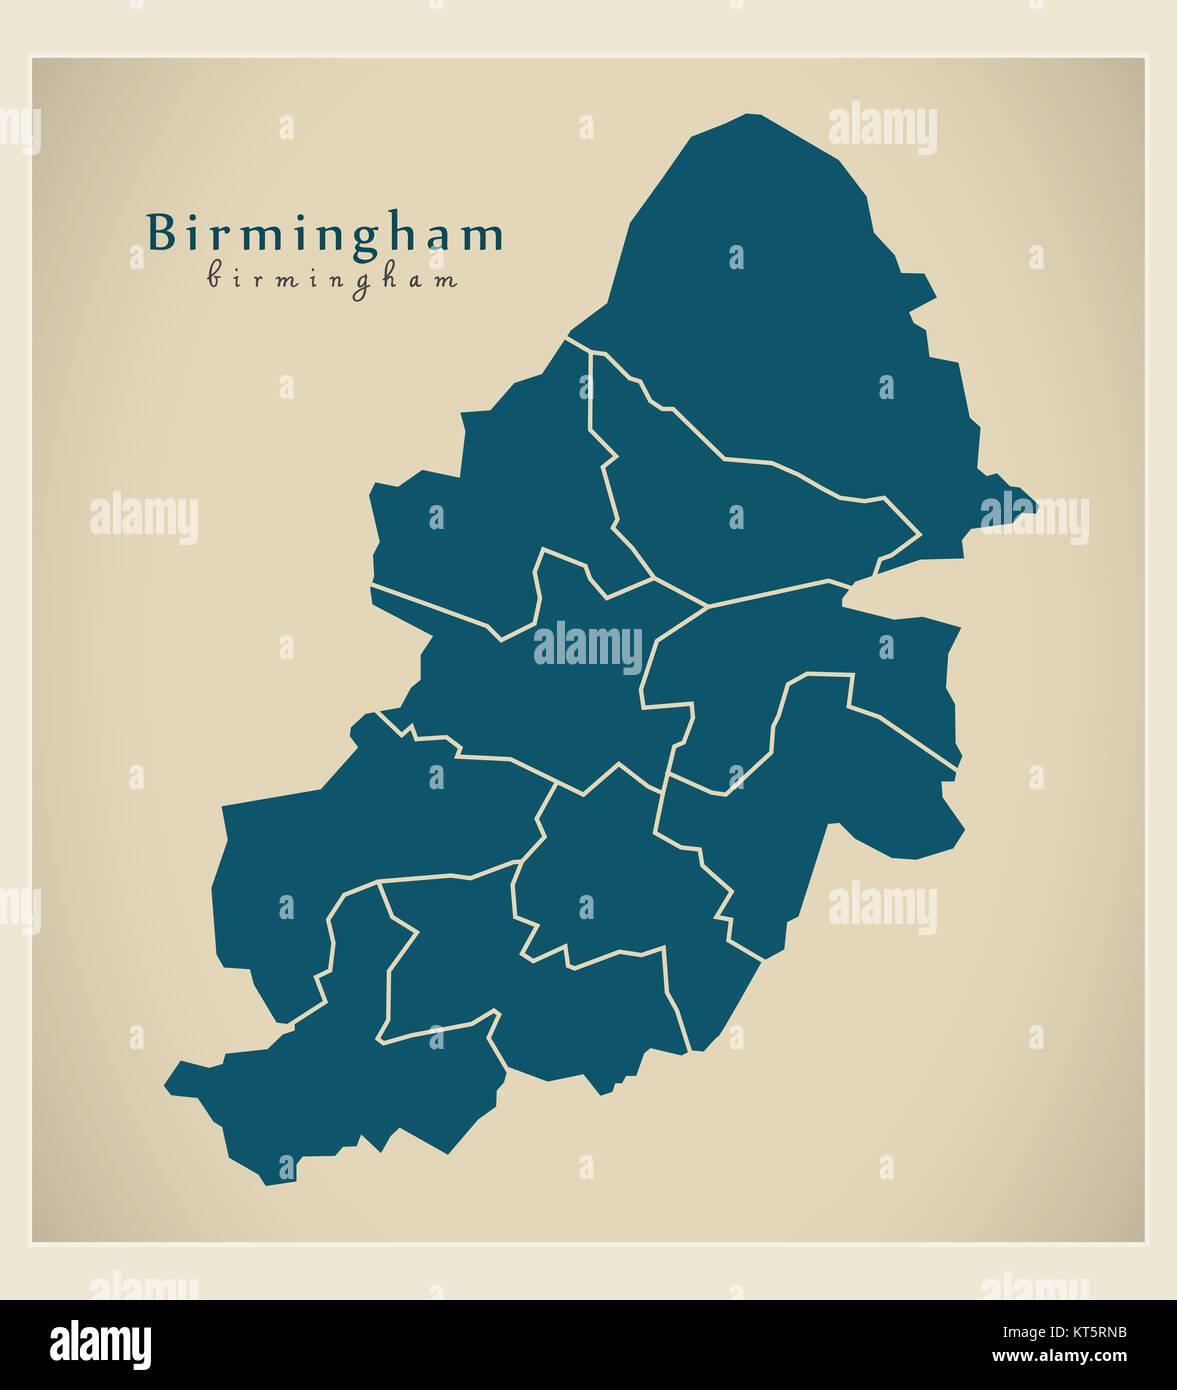 Home Of Birmingham City Stock Photos Amp Home Of Birmingham City Stock Images Alamy